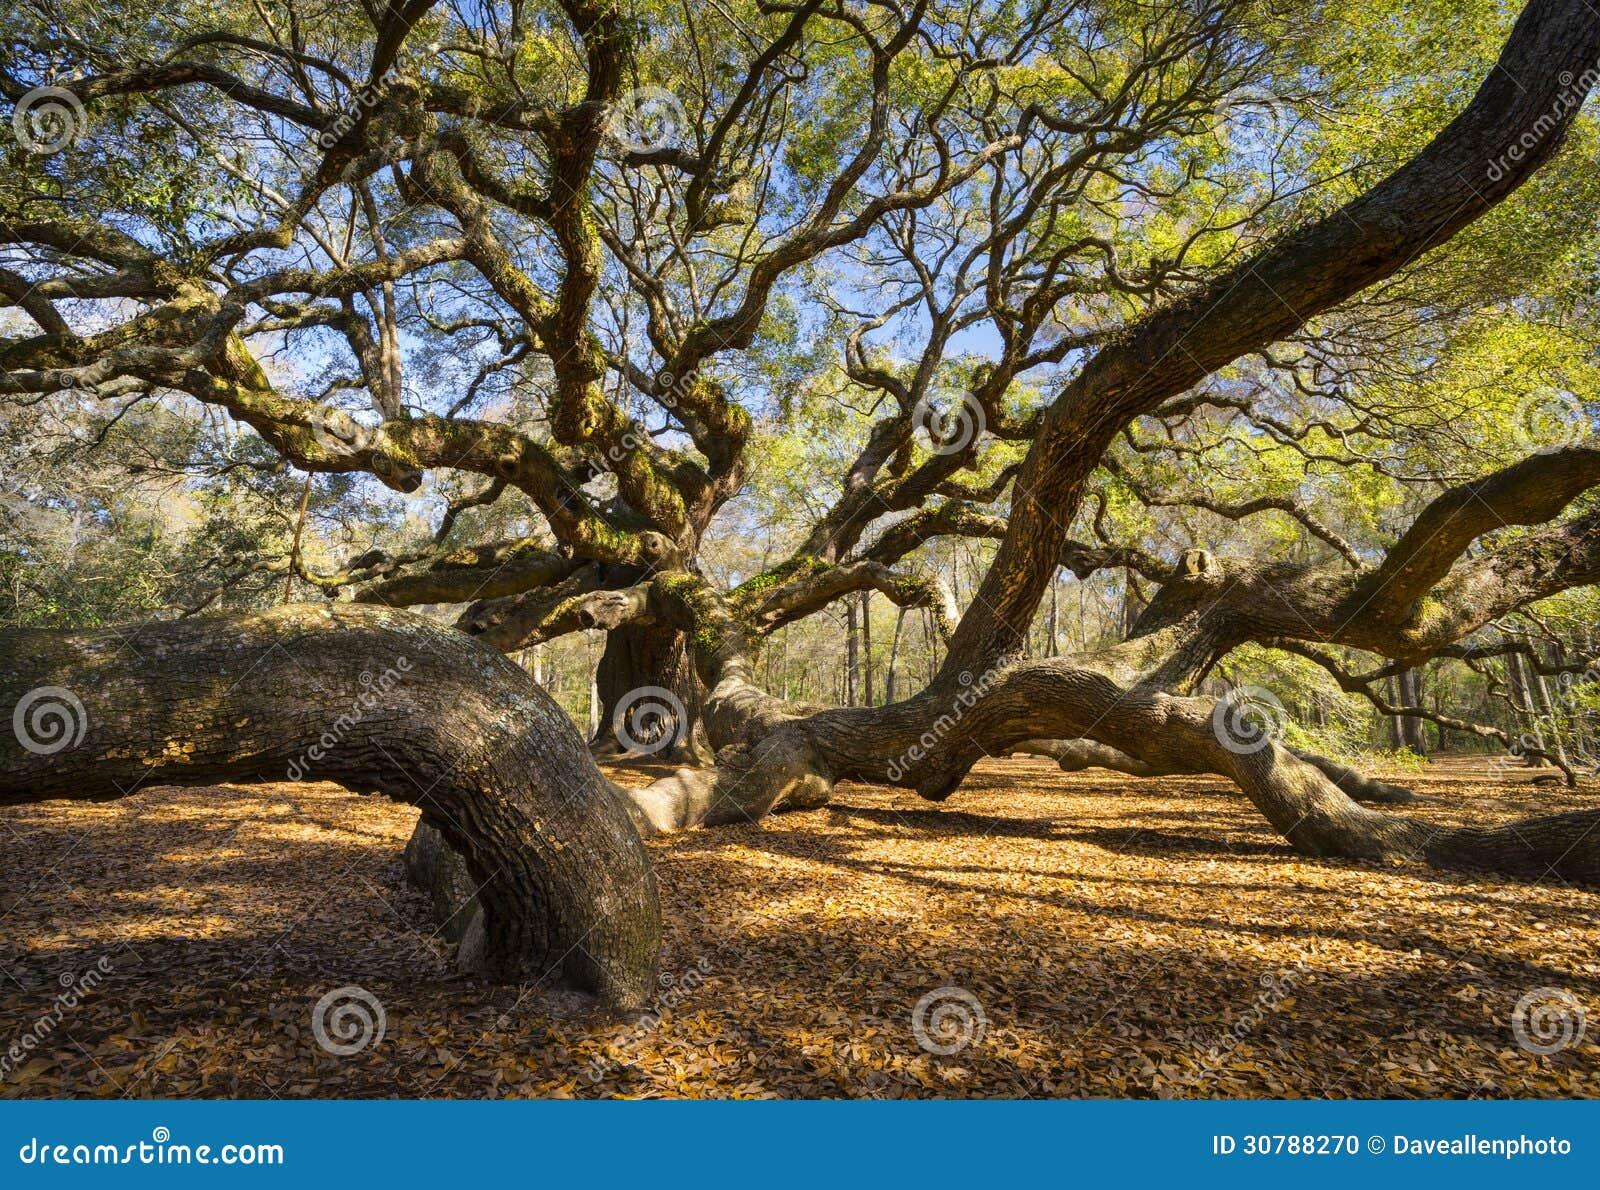 South carolina lowcountry angel oak tree charleston sc for Garden trees photos